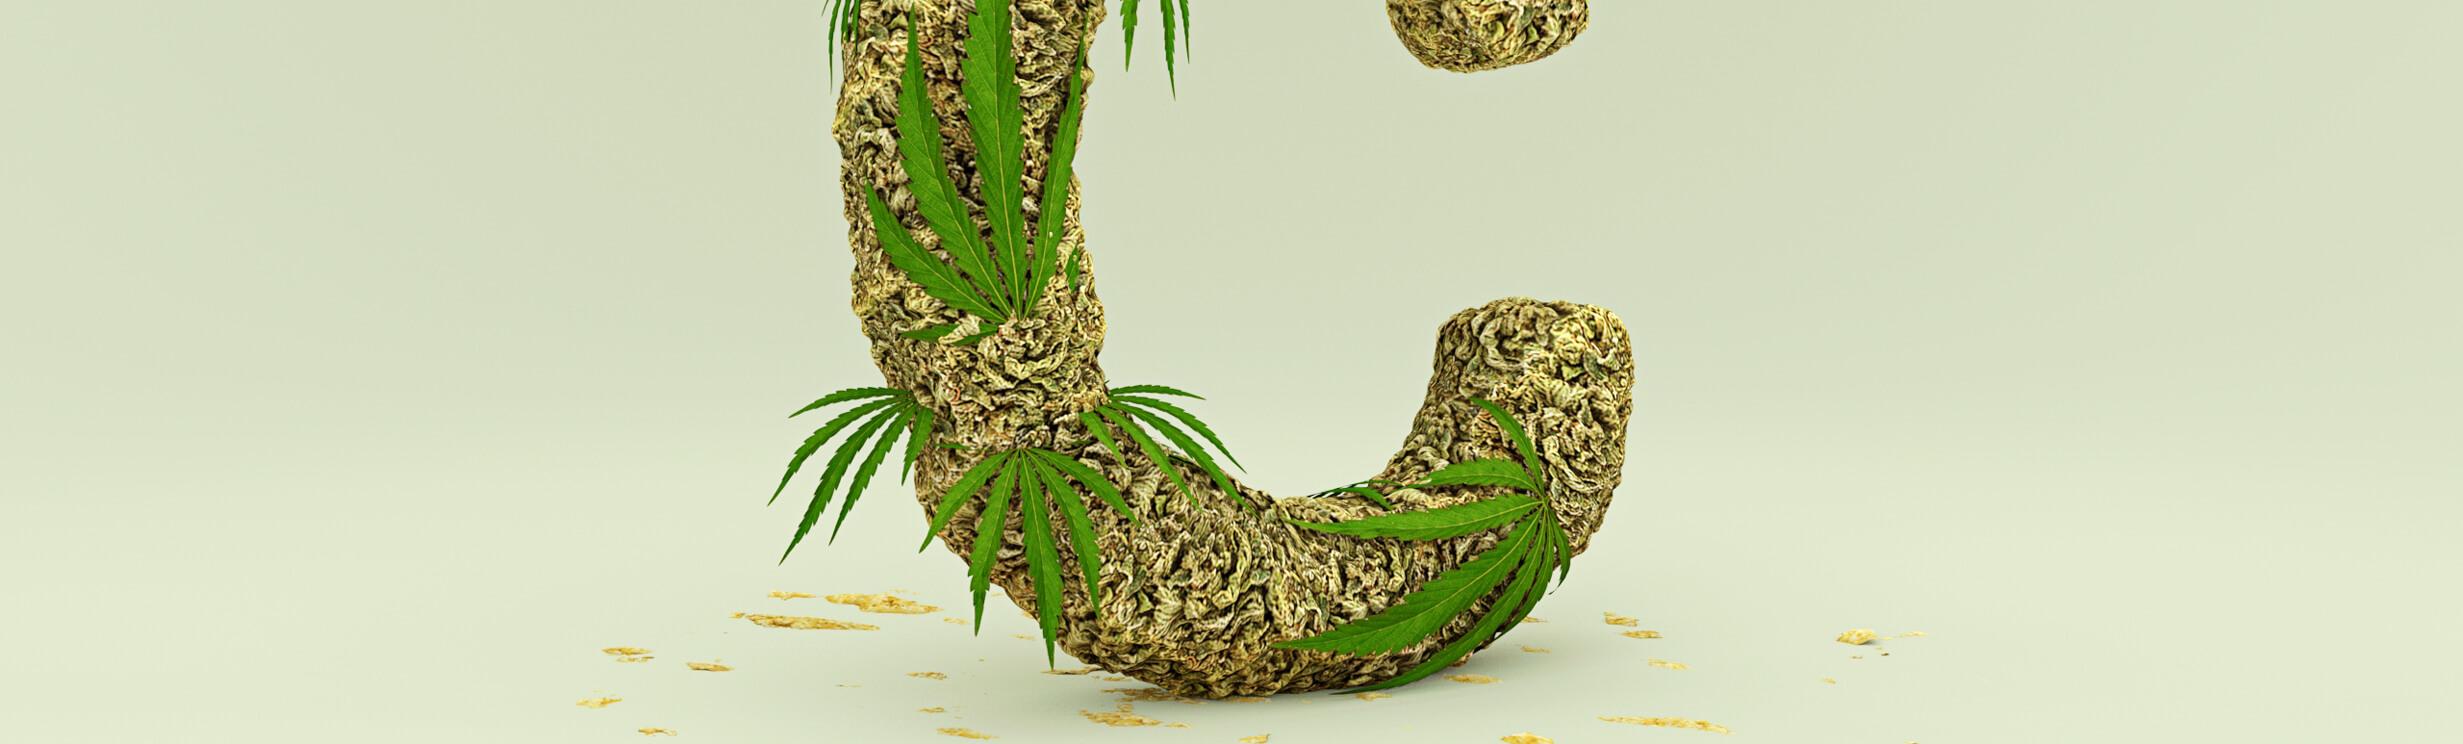 C-Cannabis_2463x744_72dpi